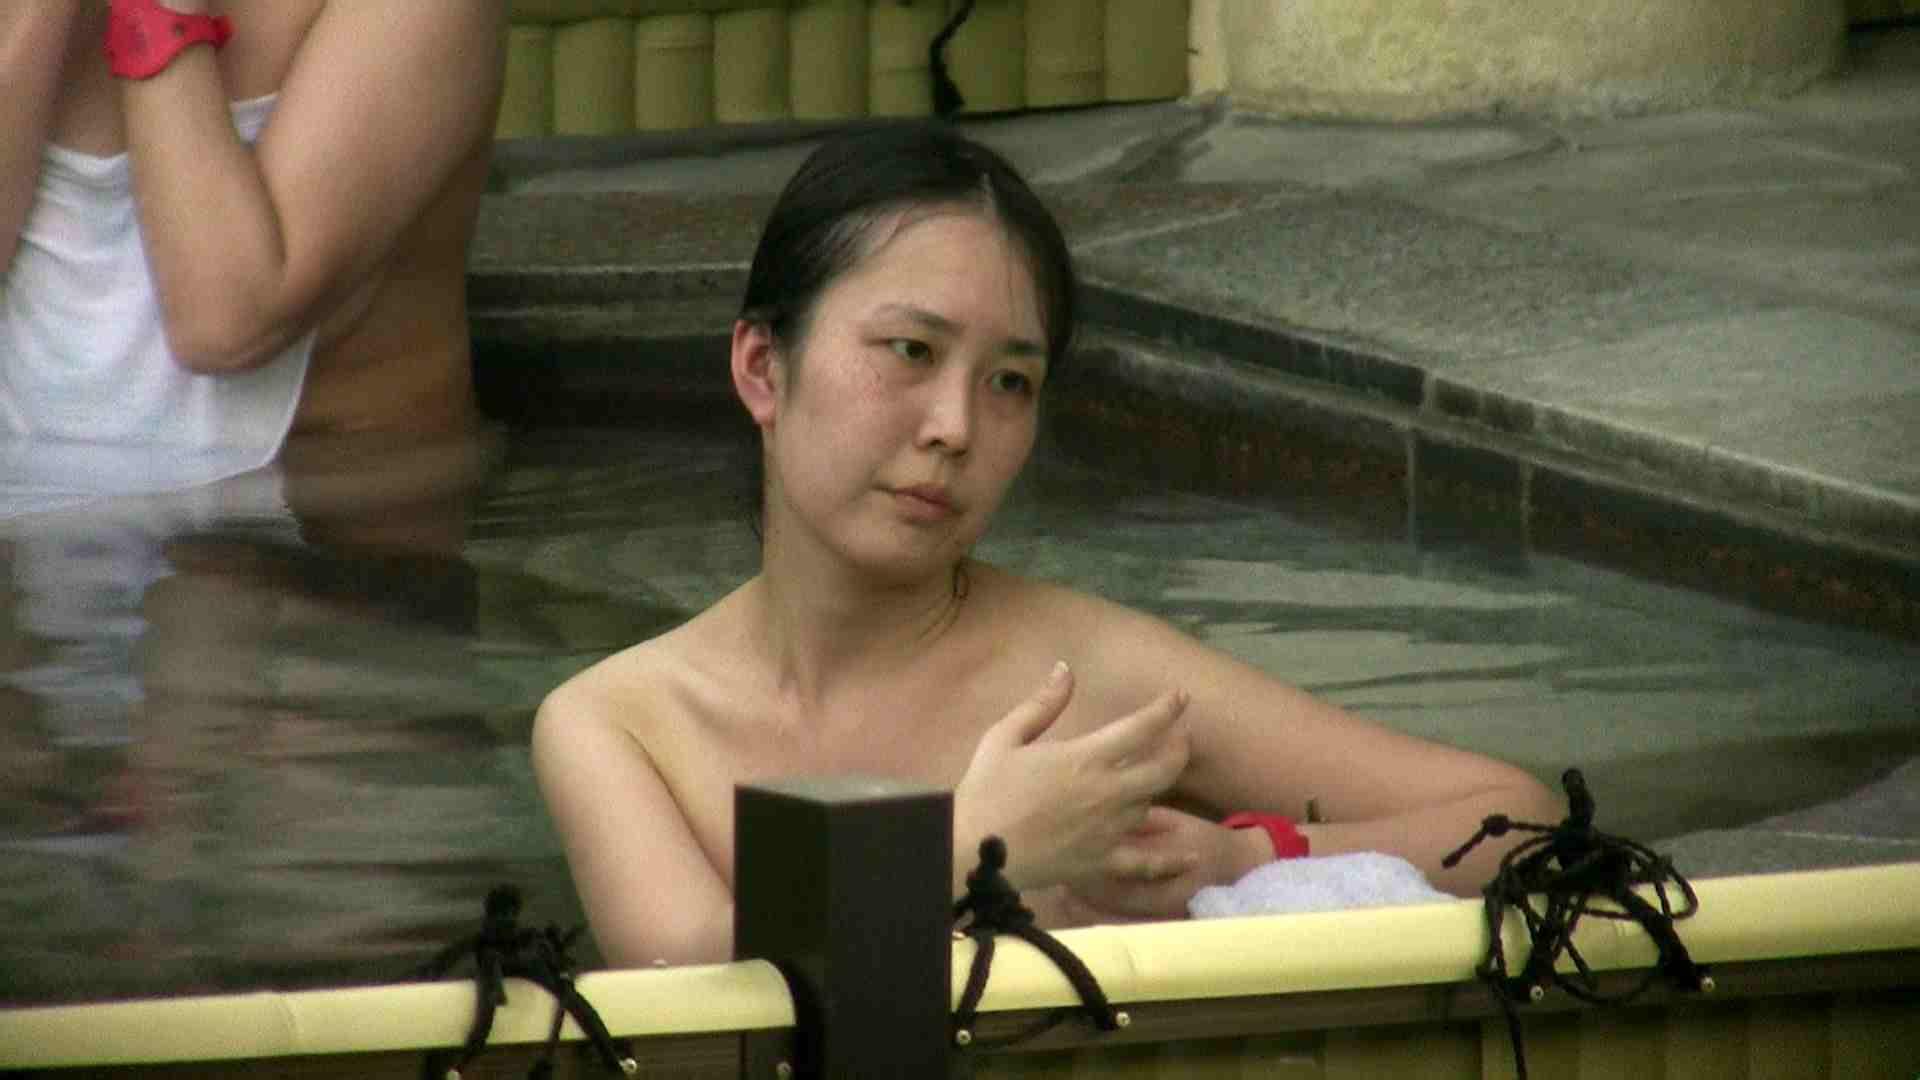 Aquaな露天風呂Vol.636 女体盗撮 盗み撮りSEX無修正画像 87連発 77